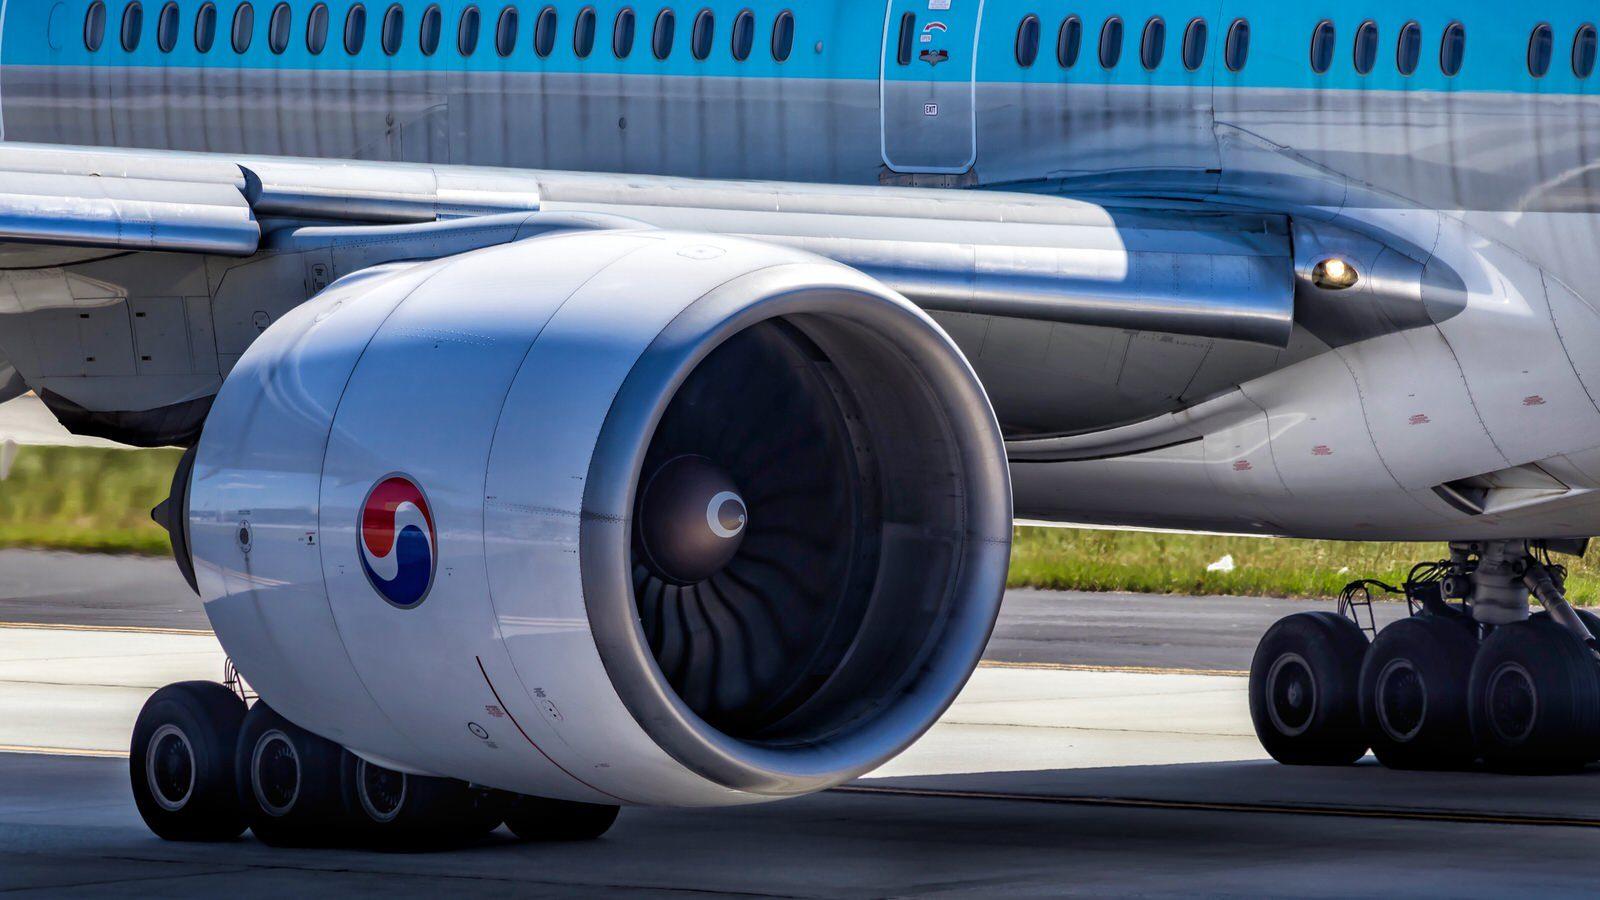 Engine on Korean Air Boeing 777-300ER